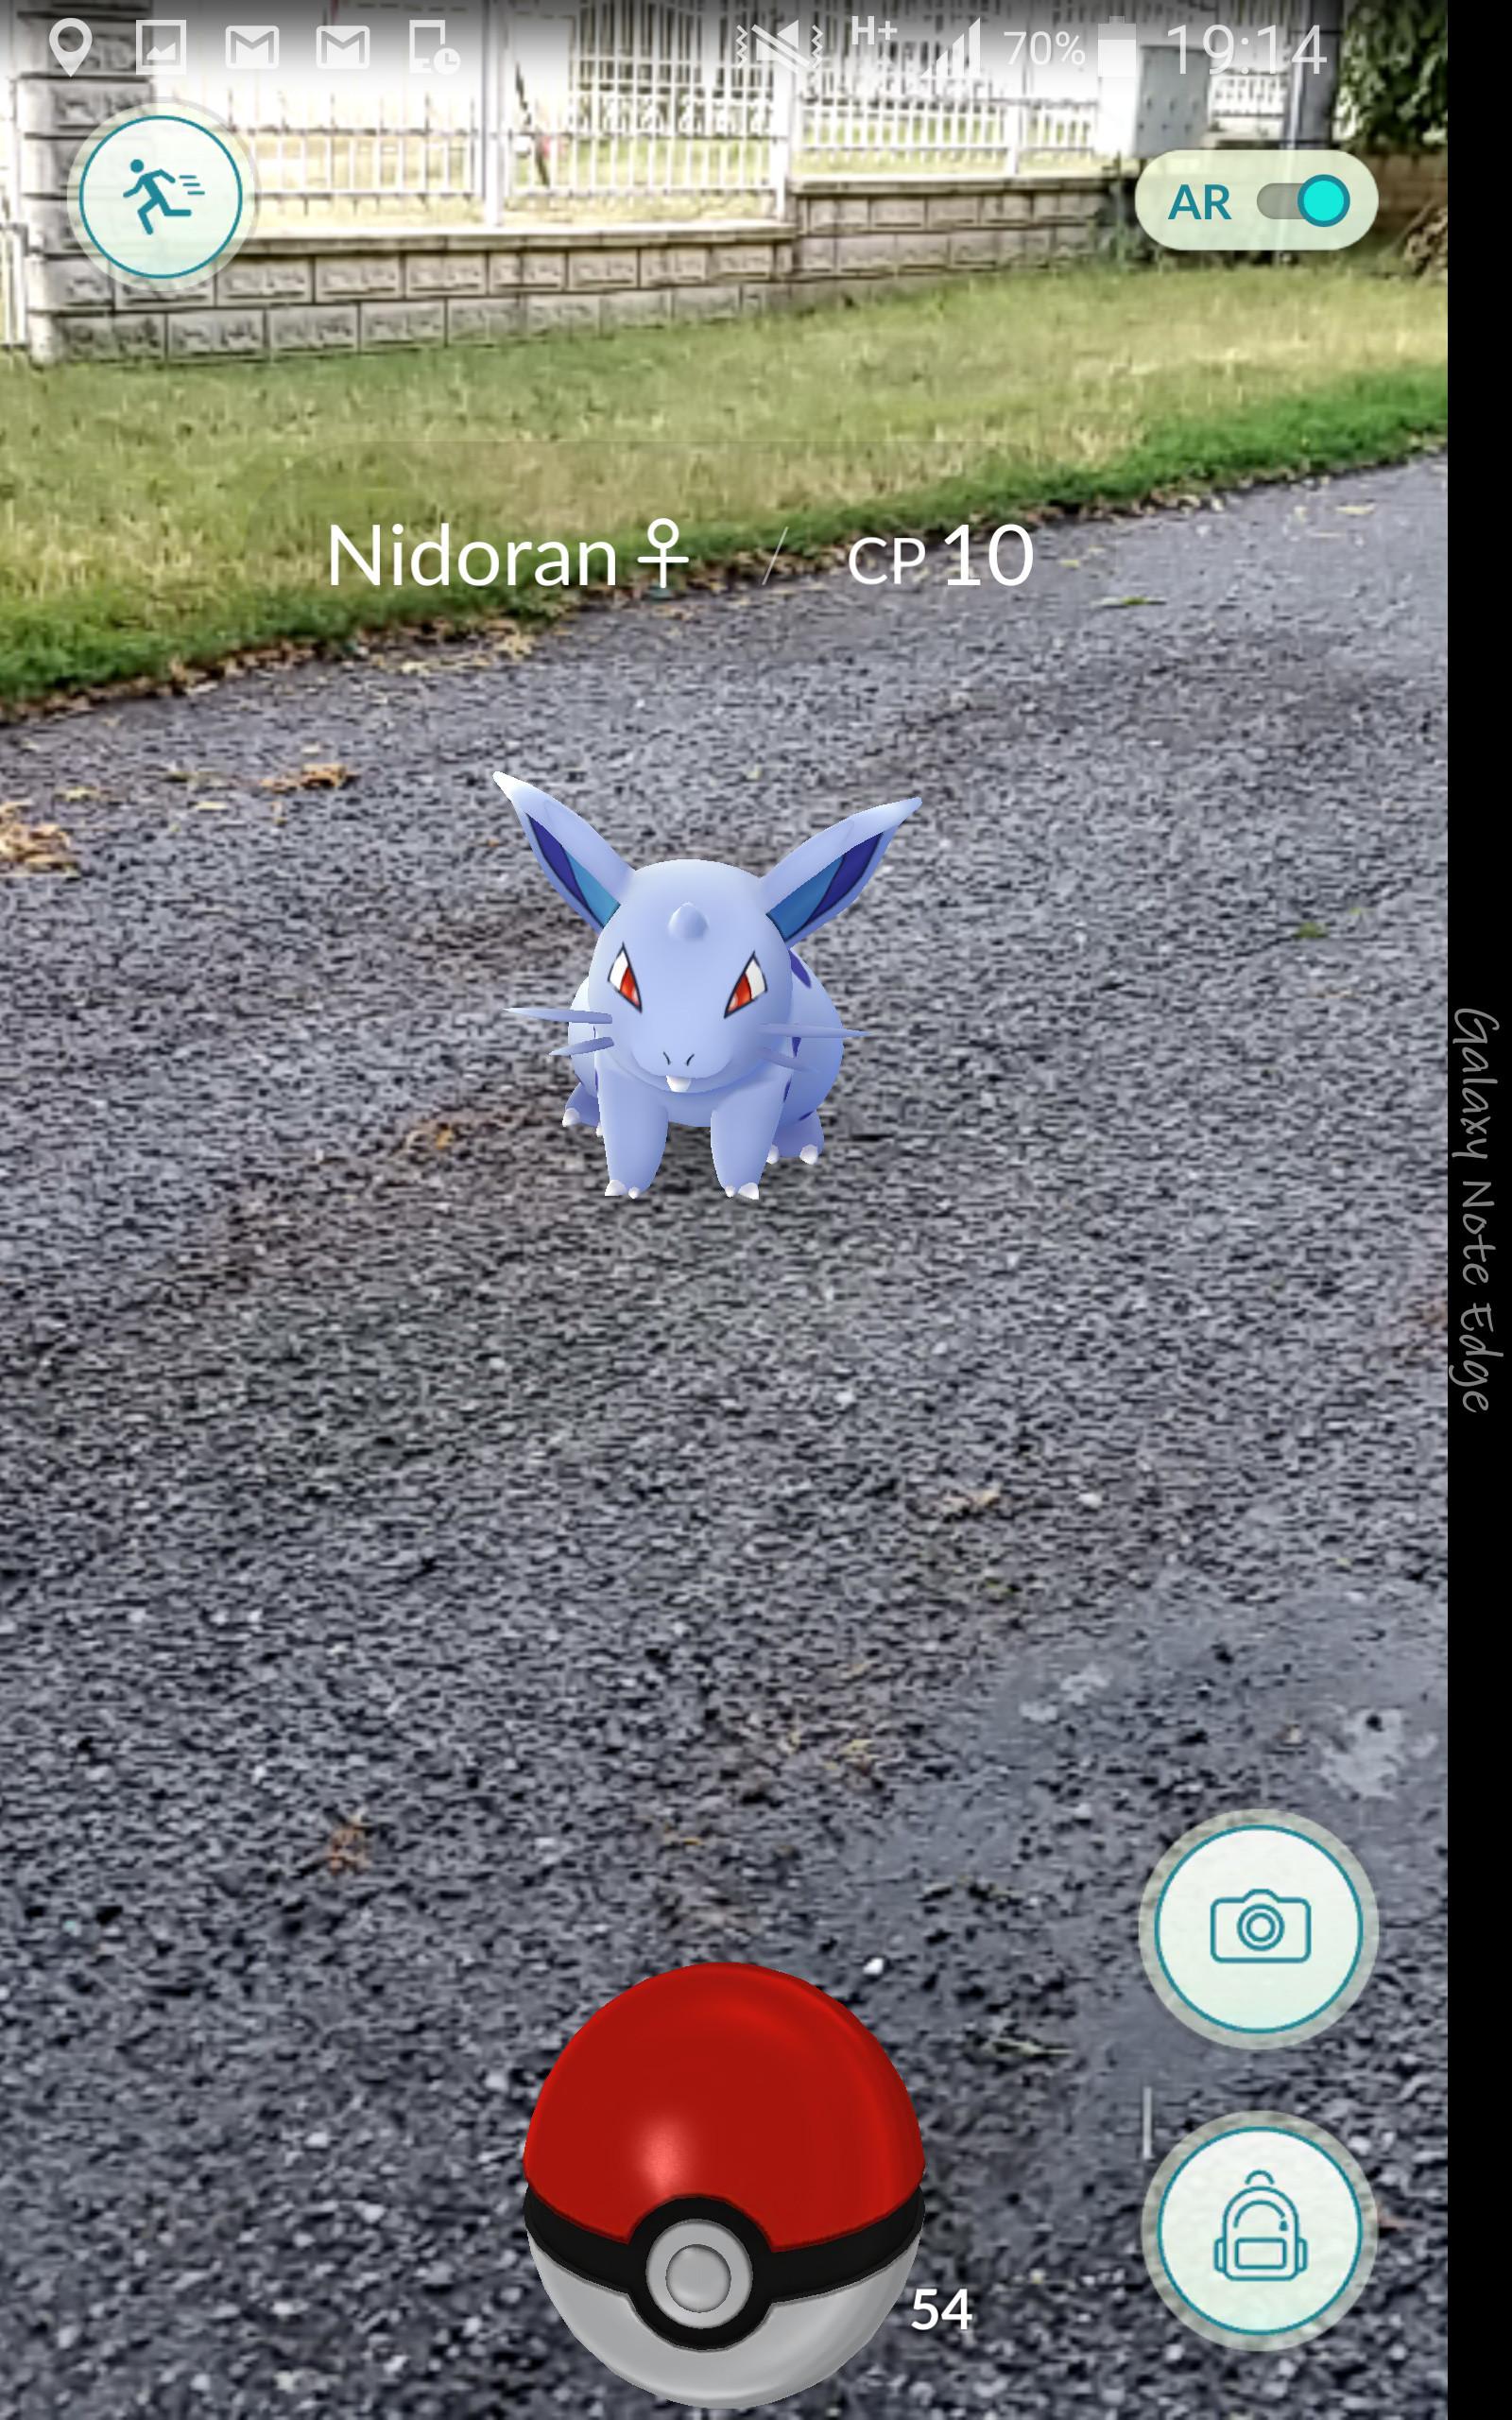 Chytanie Nidorana